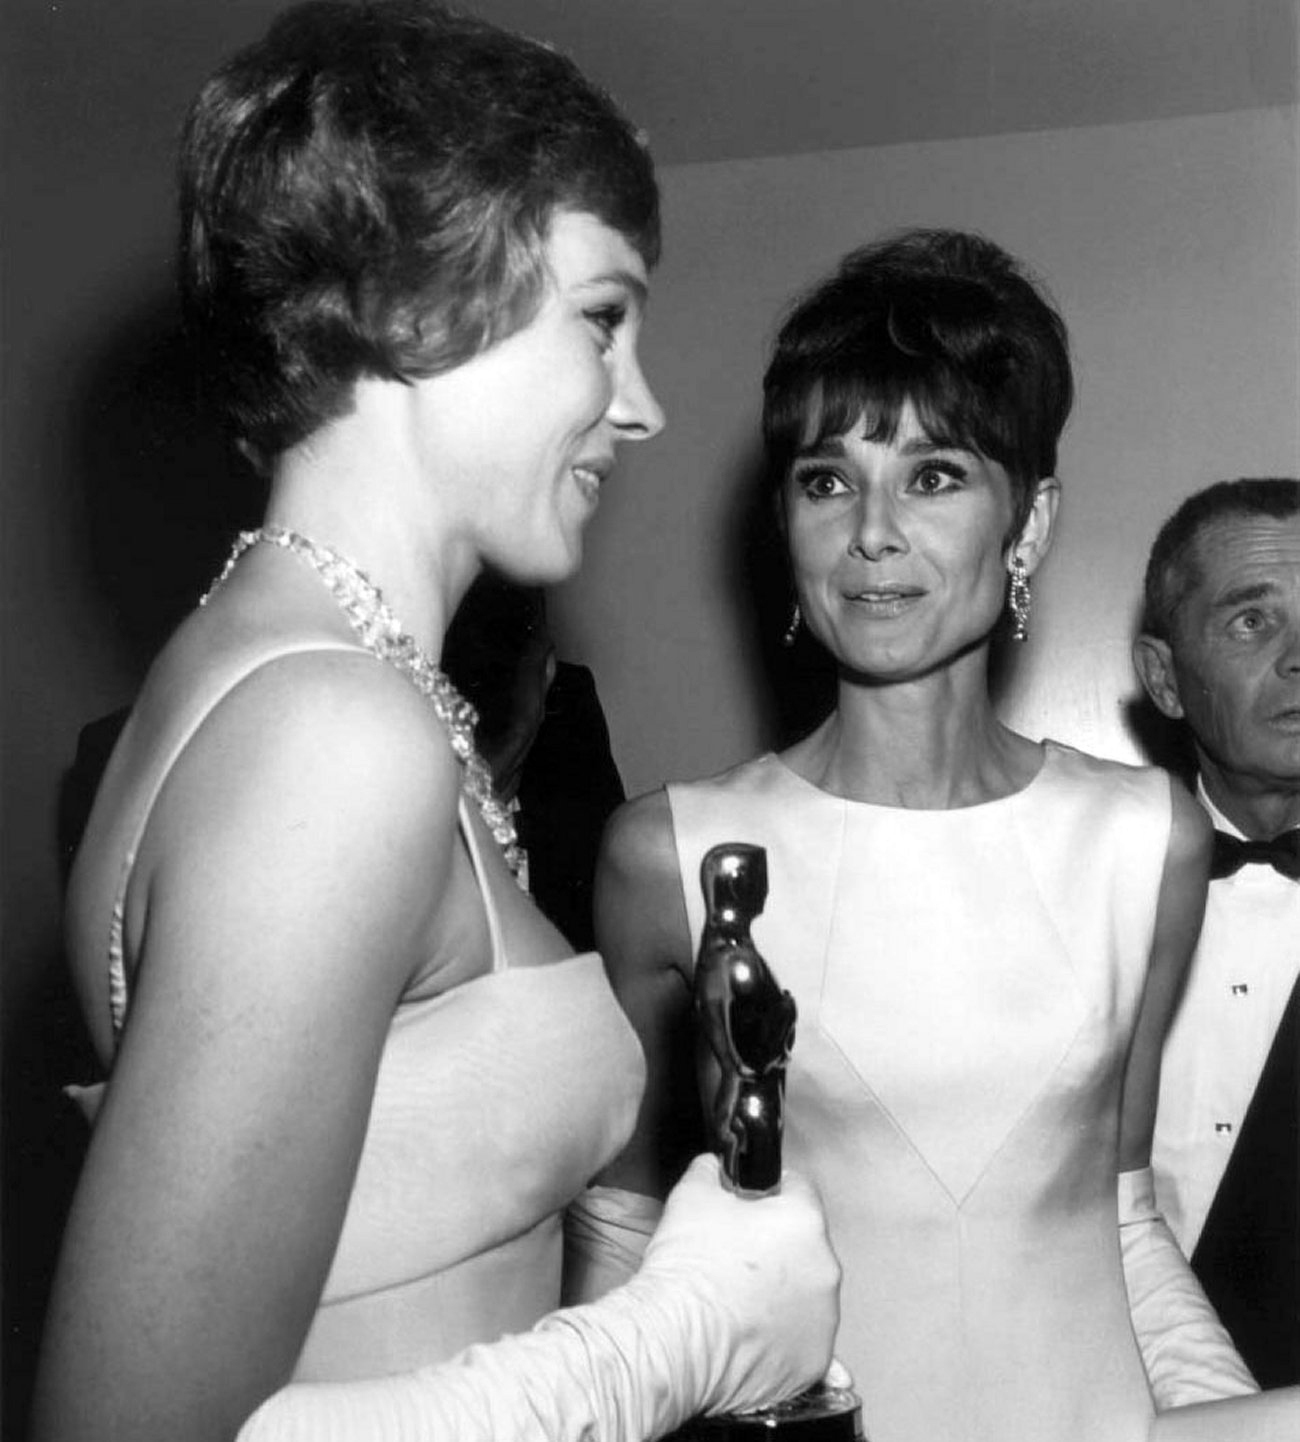 http://2.bp.blogspot.com/_Bwa4ZwGhMM8/TKZxbU_UhaI/AAAAAAAAA1c/pMNt-uPUybY/s1600/Audrey-Hepburn-and-Julie-Andrews-actresses-5201574-1300-1442.jpg